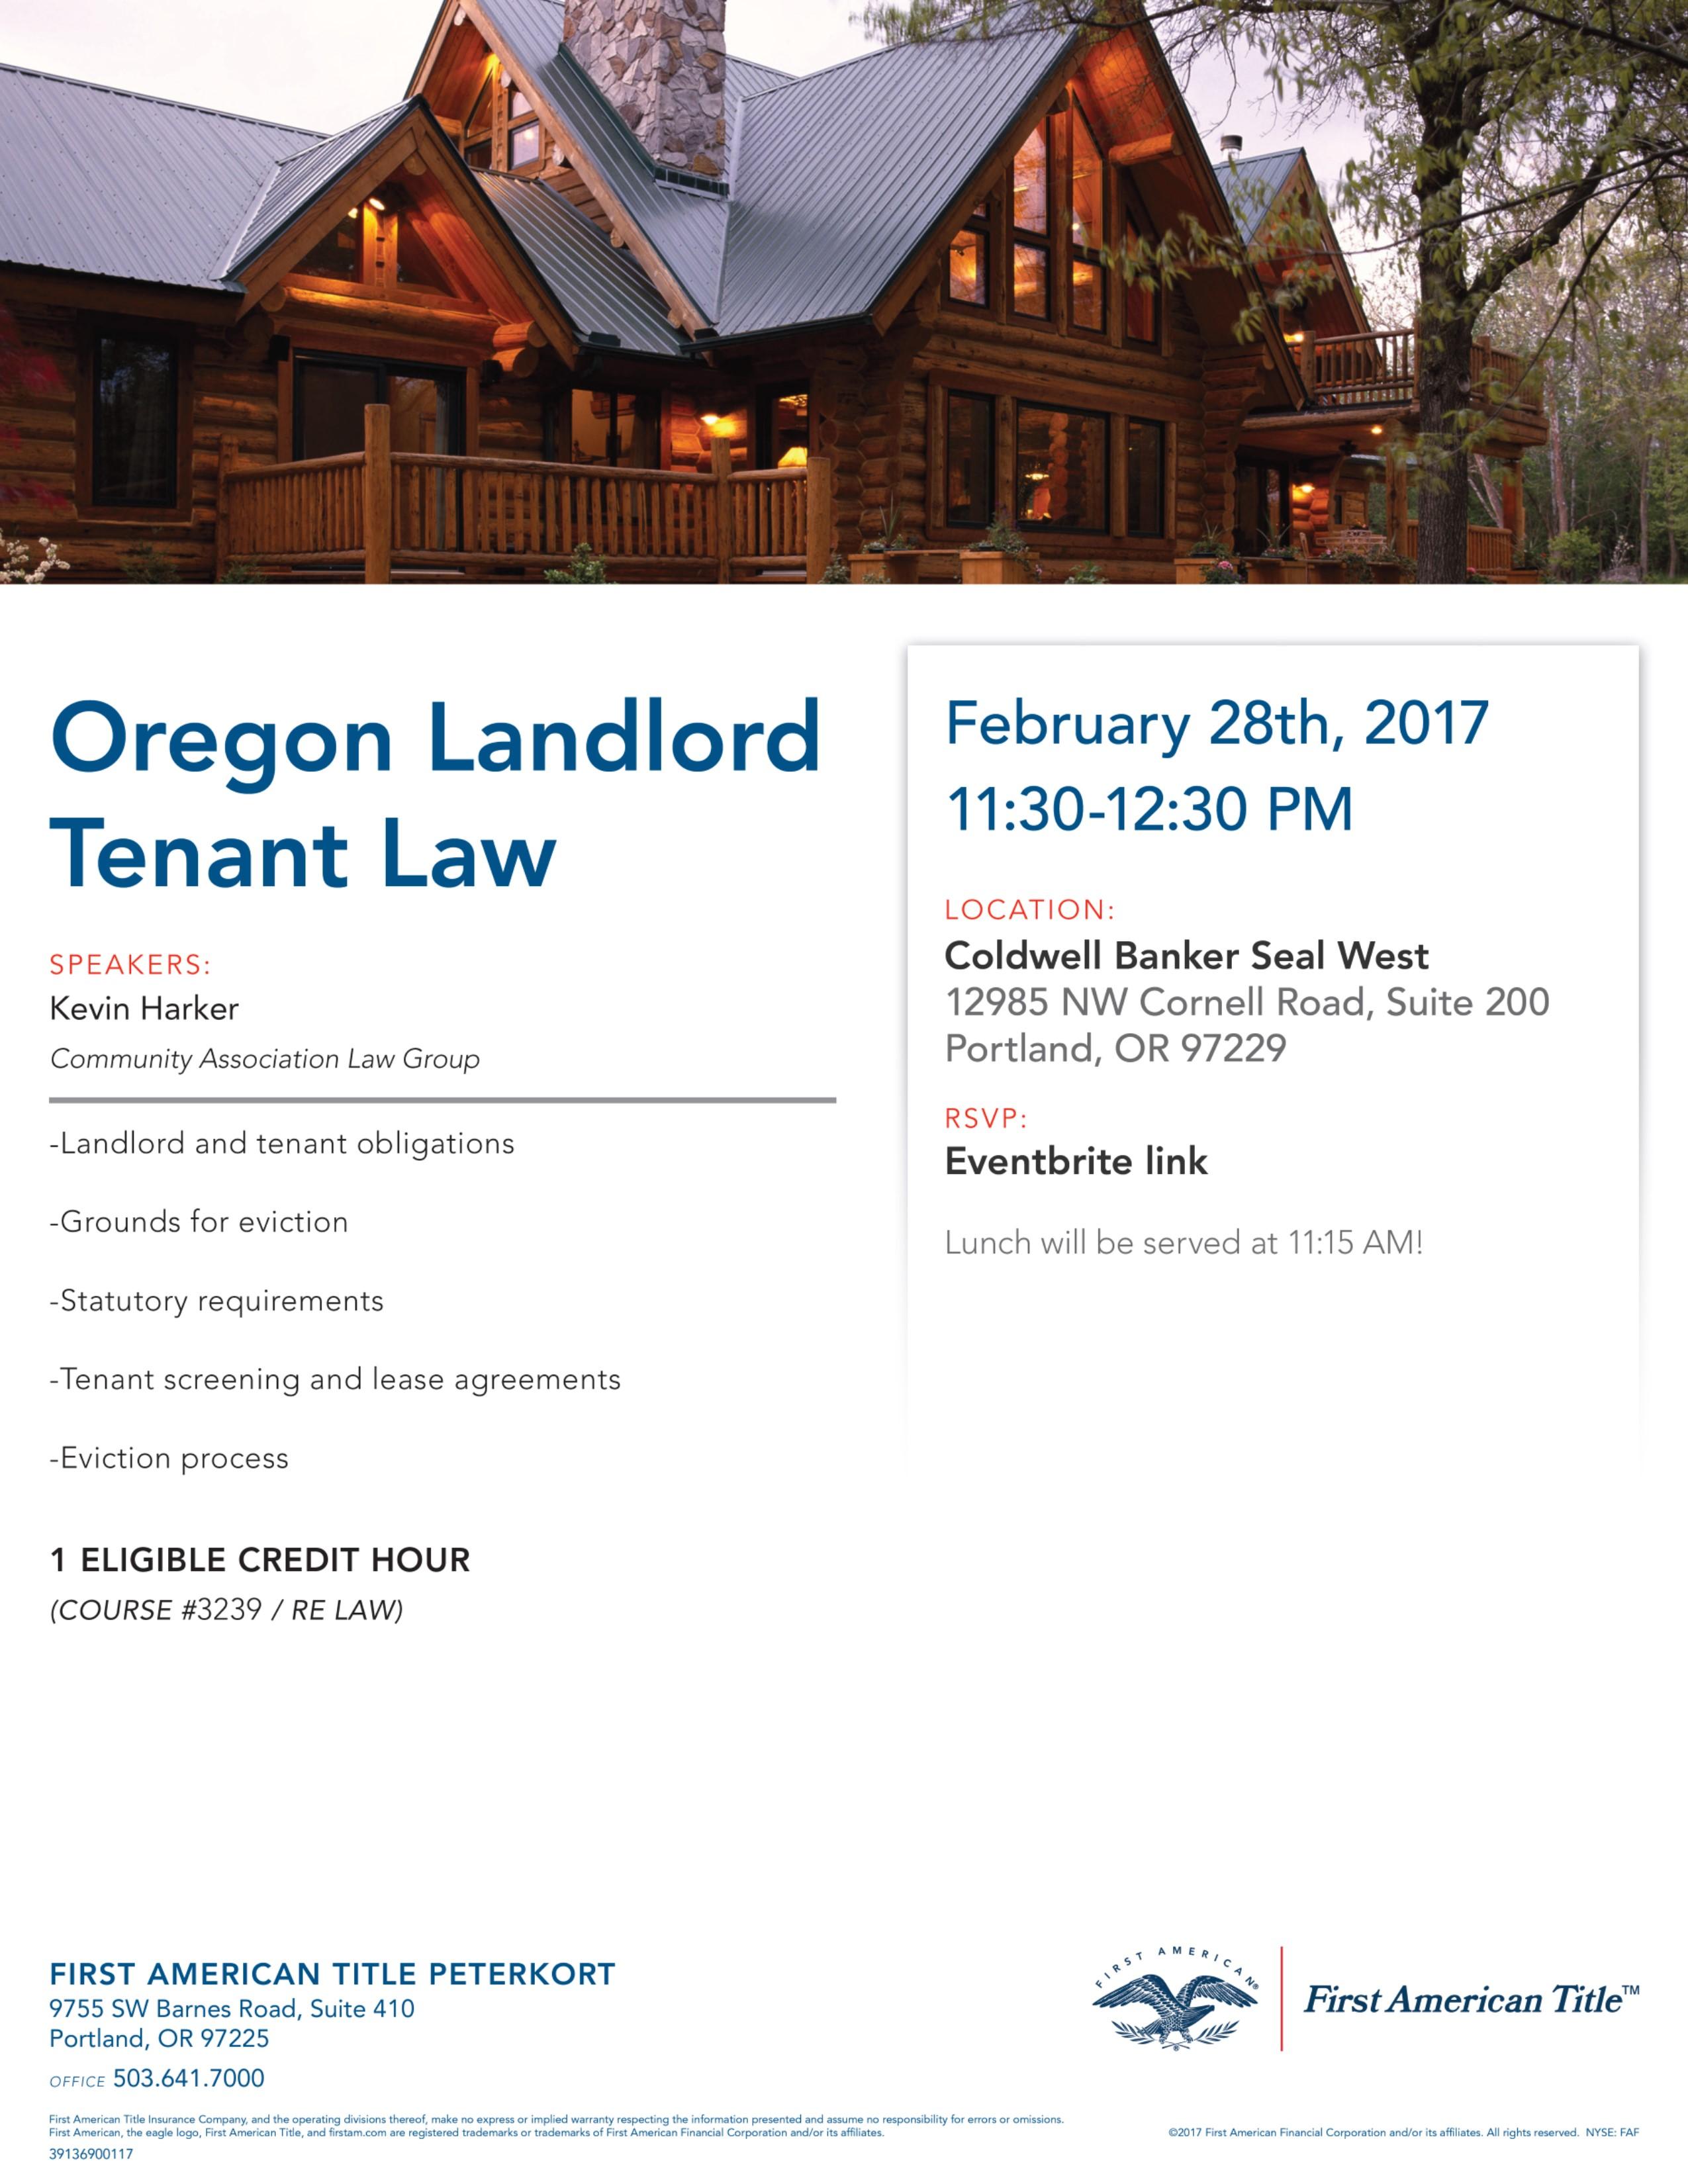 Landlord_Tenant_Law_CB_Pdx_West_Feb_28th